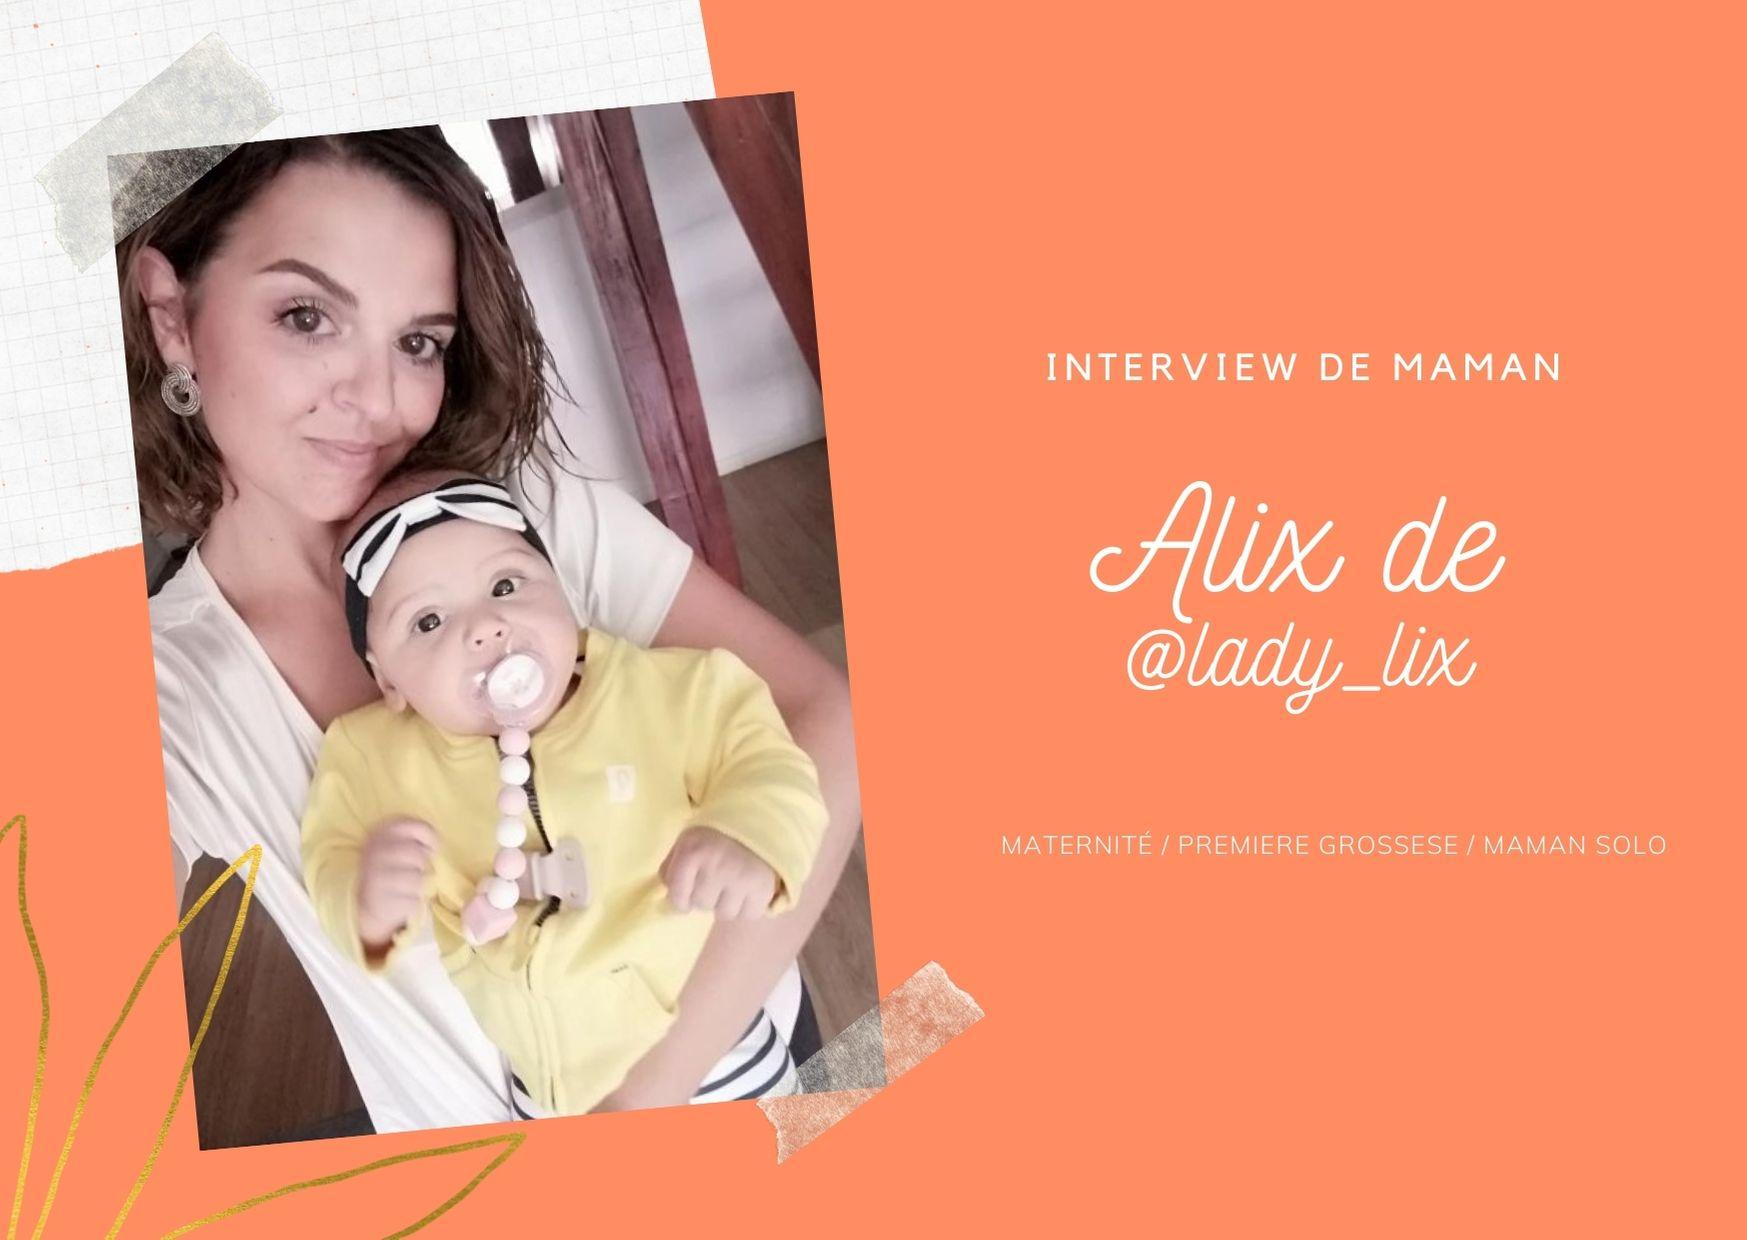 Maman solon interview